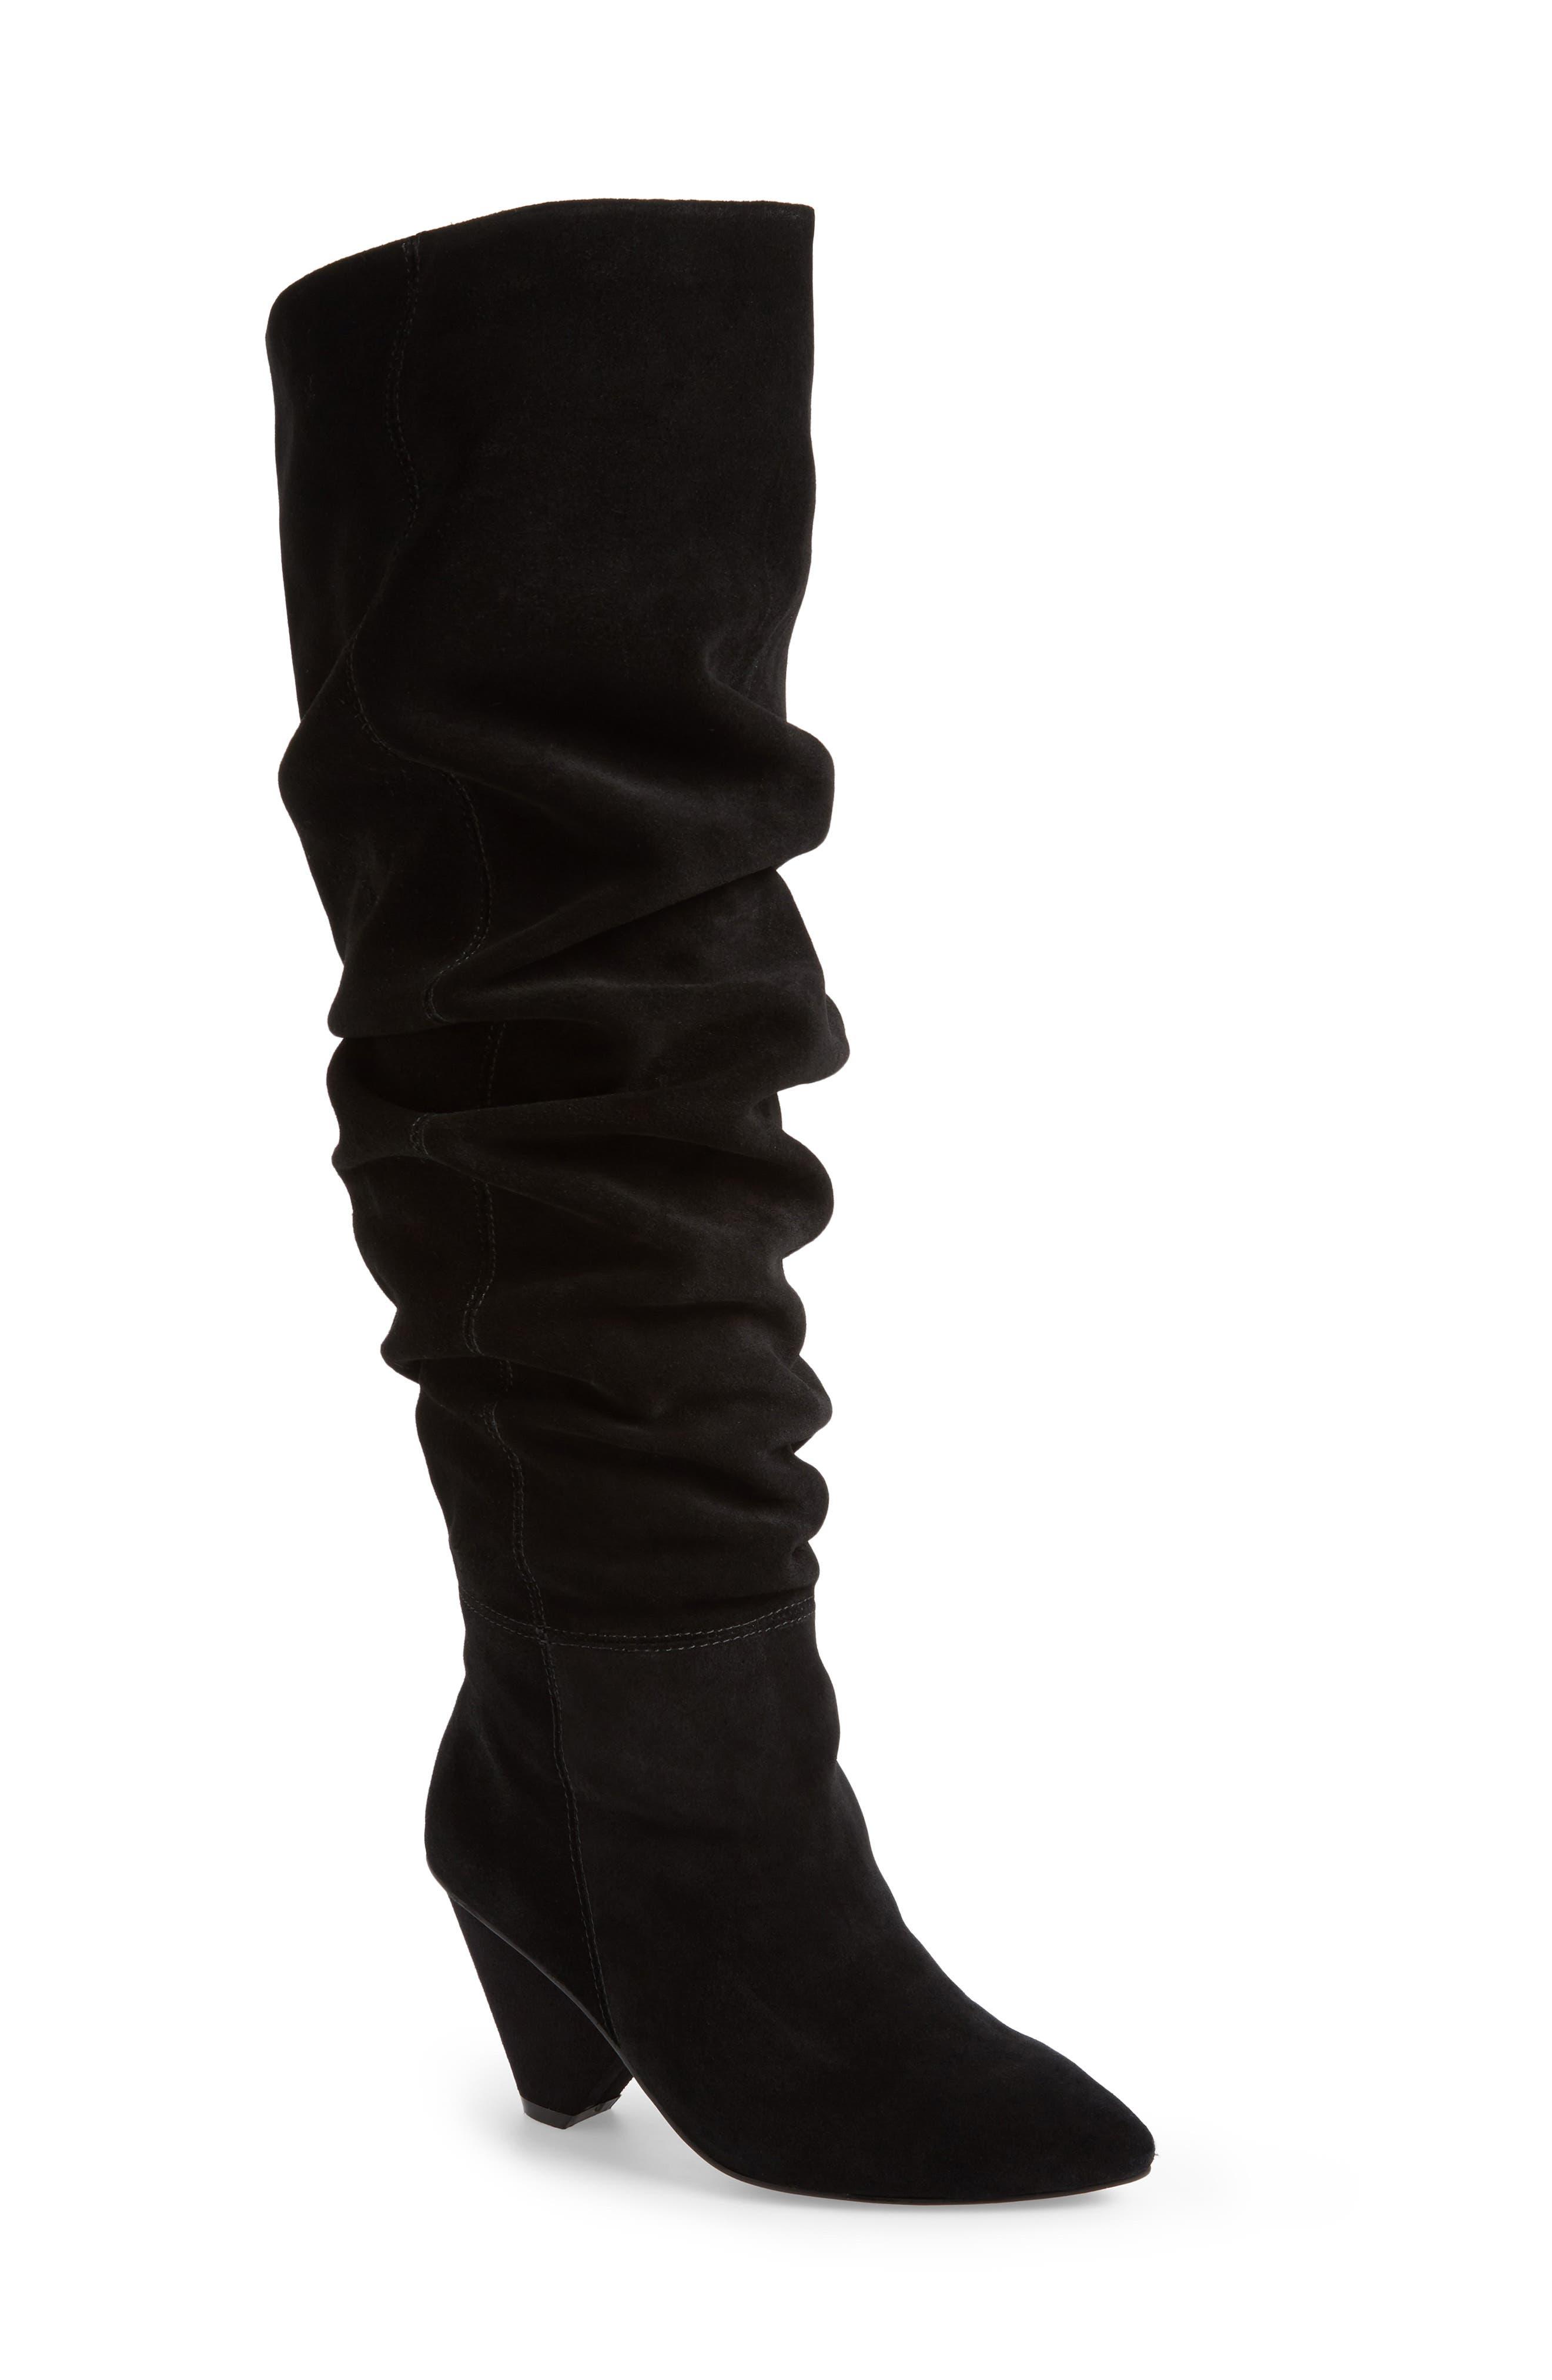 Senita Over the Knee Boot,                         Main,                         color, 005